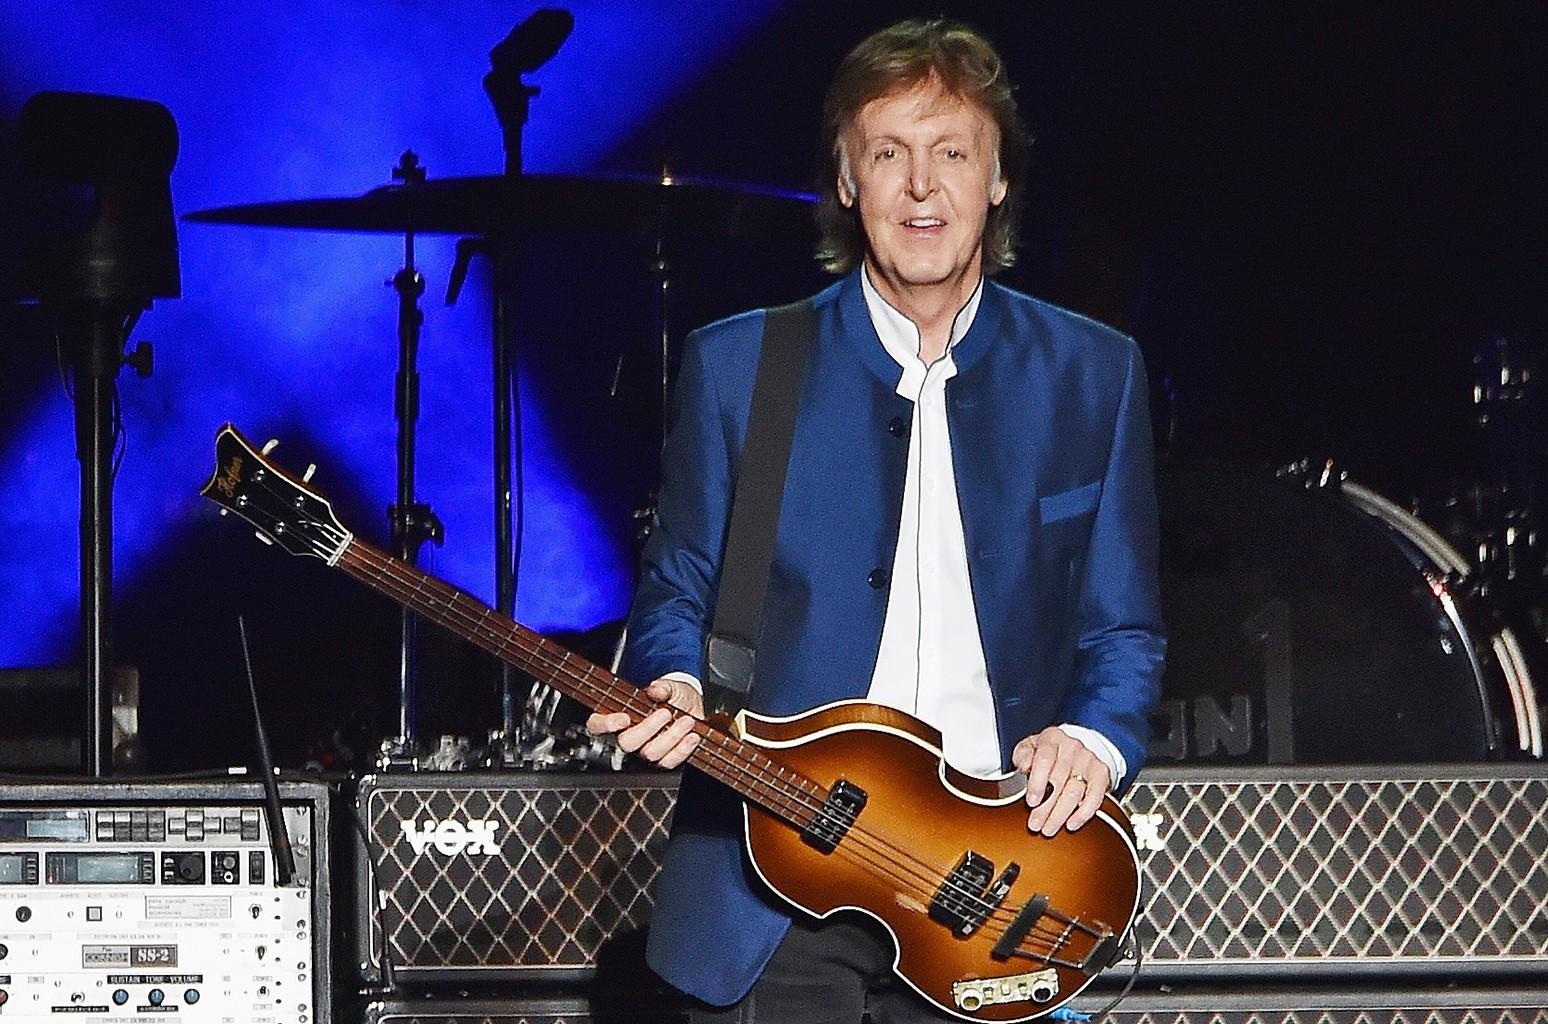 Paul McCartney performs at MetLife Stadium